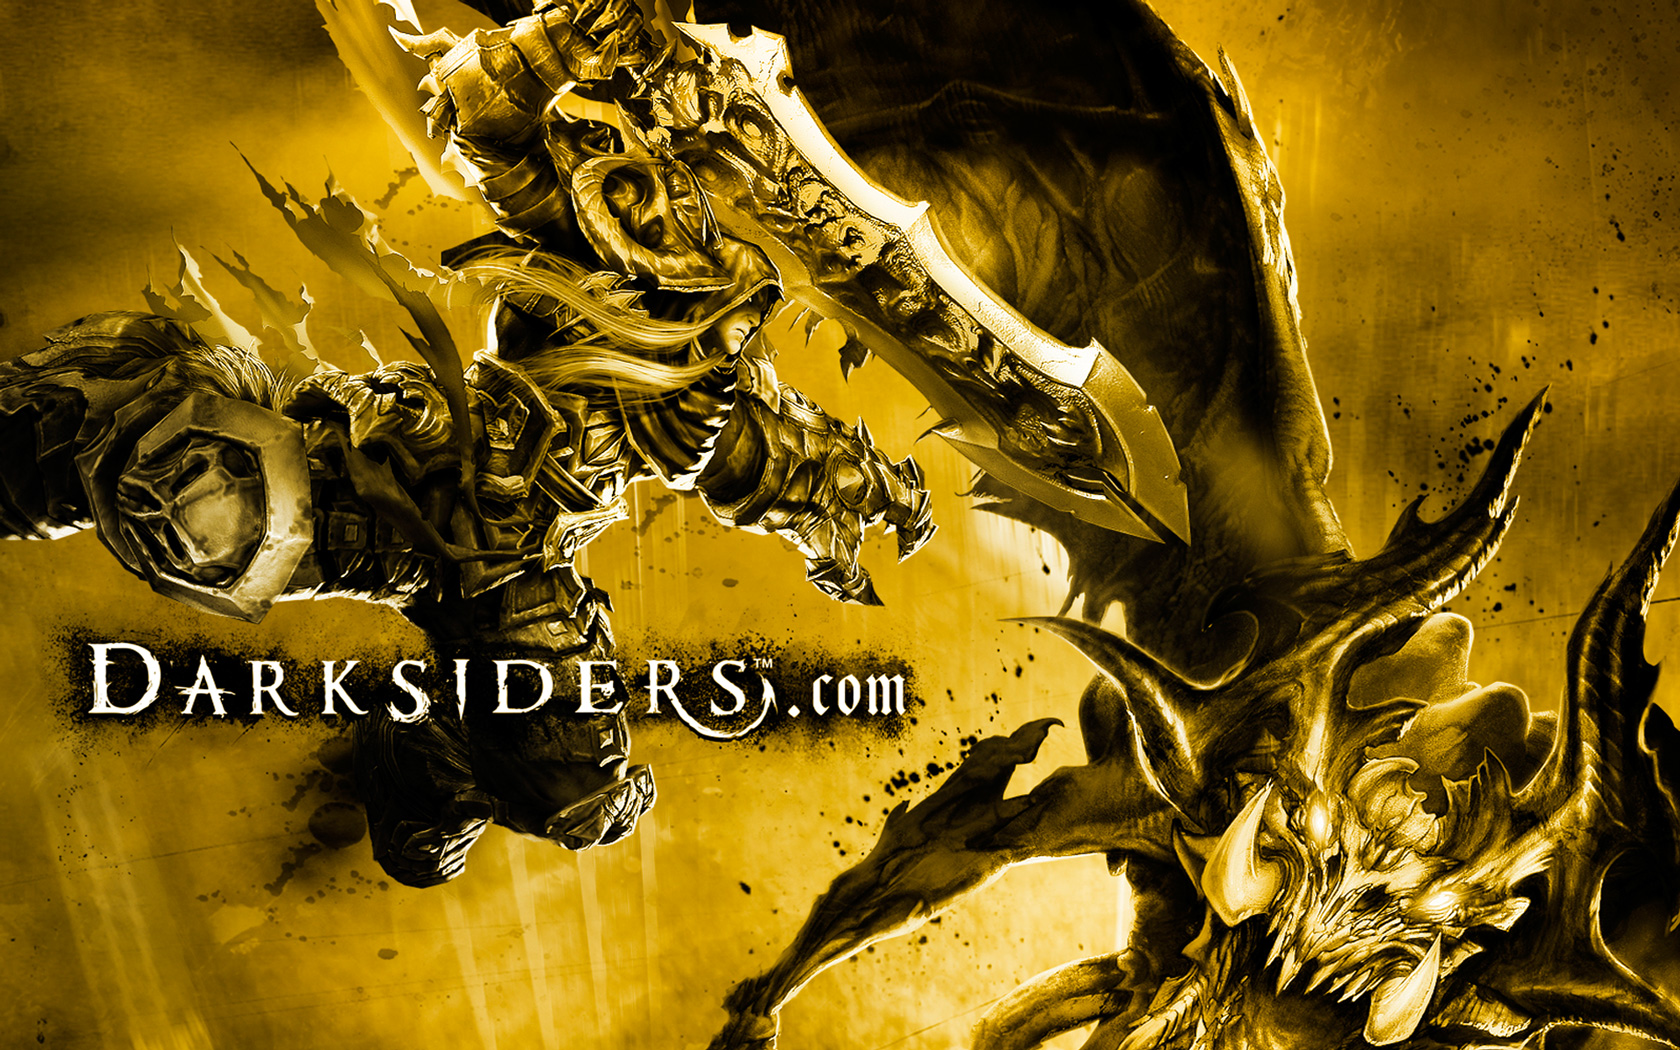 Darksiders Wallpaper in 1680x1050